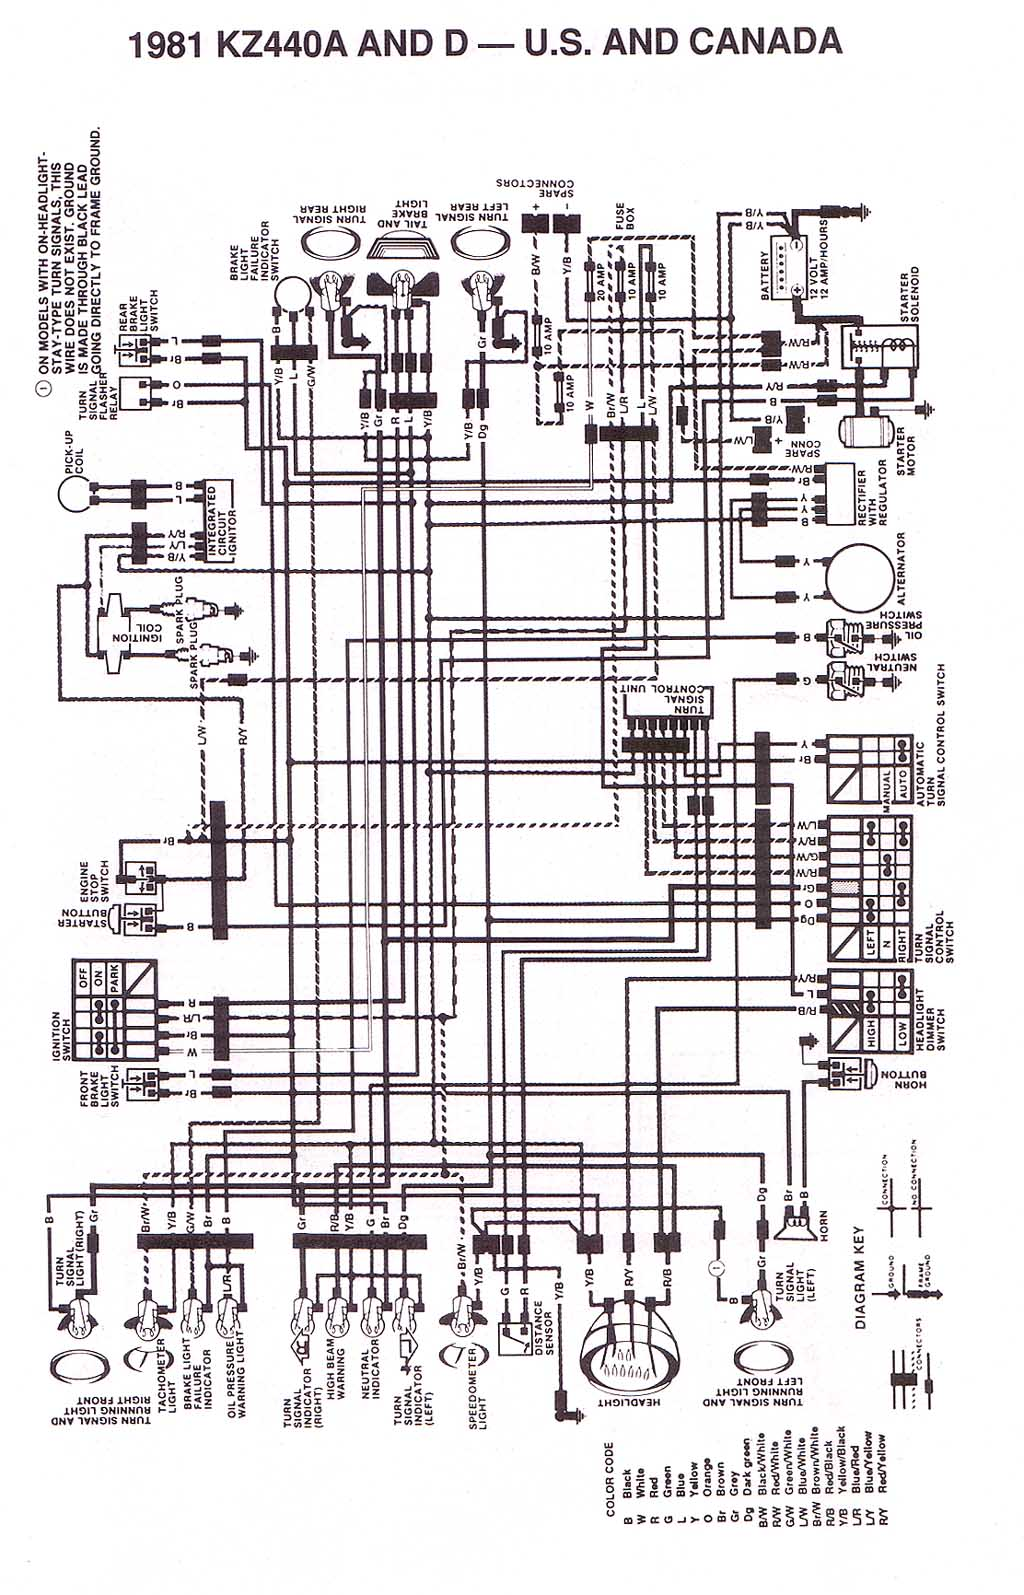 1980 kawasaki kz 440 igniter wiring diagram kz  u2022 gsmportal co